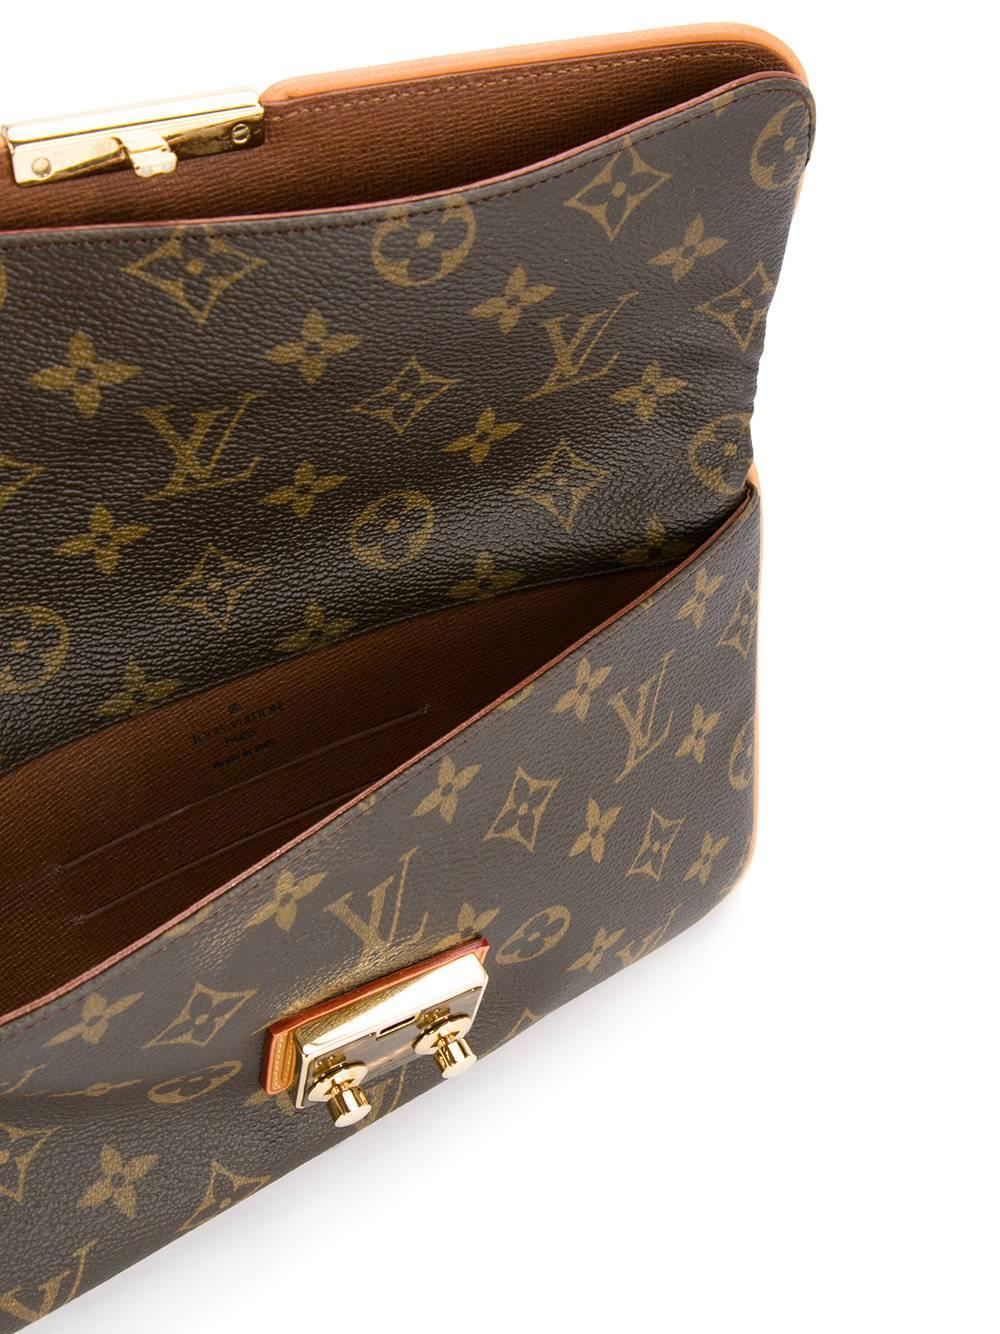 Louis Vuitton Monogram Canvas Gold Evening Clutch Foldover Flap Bag In Box I3SGujh8